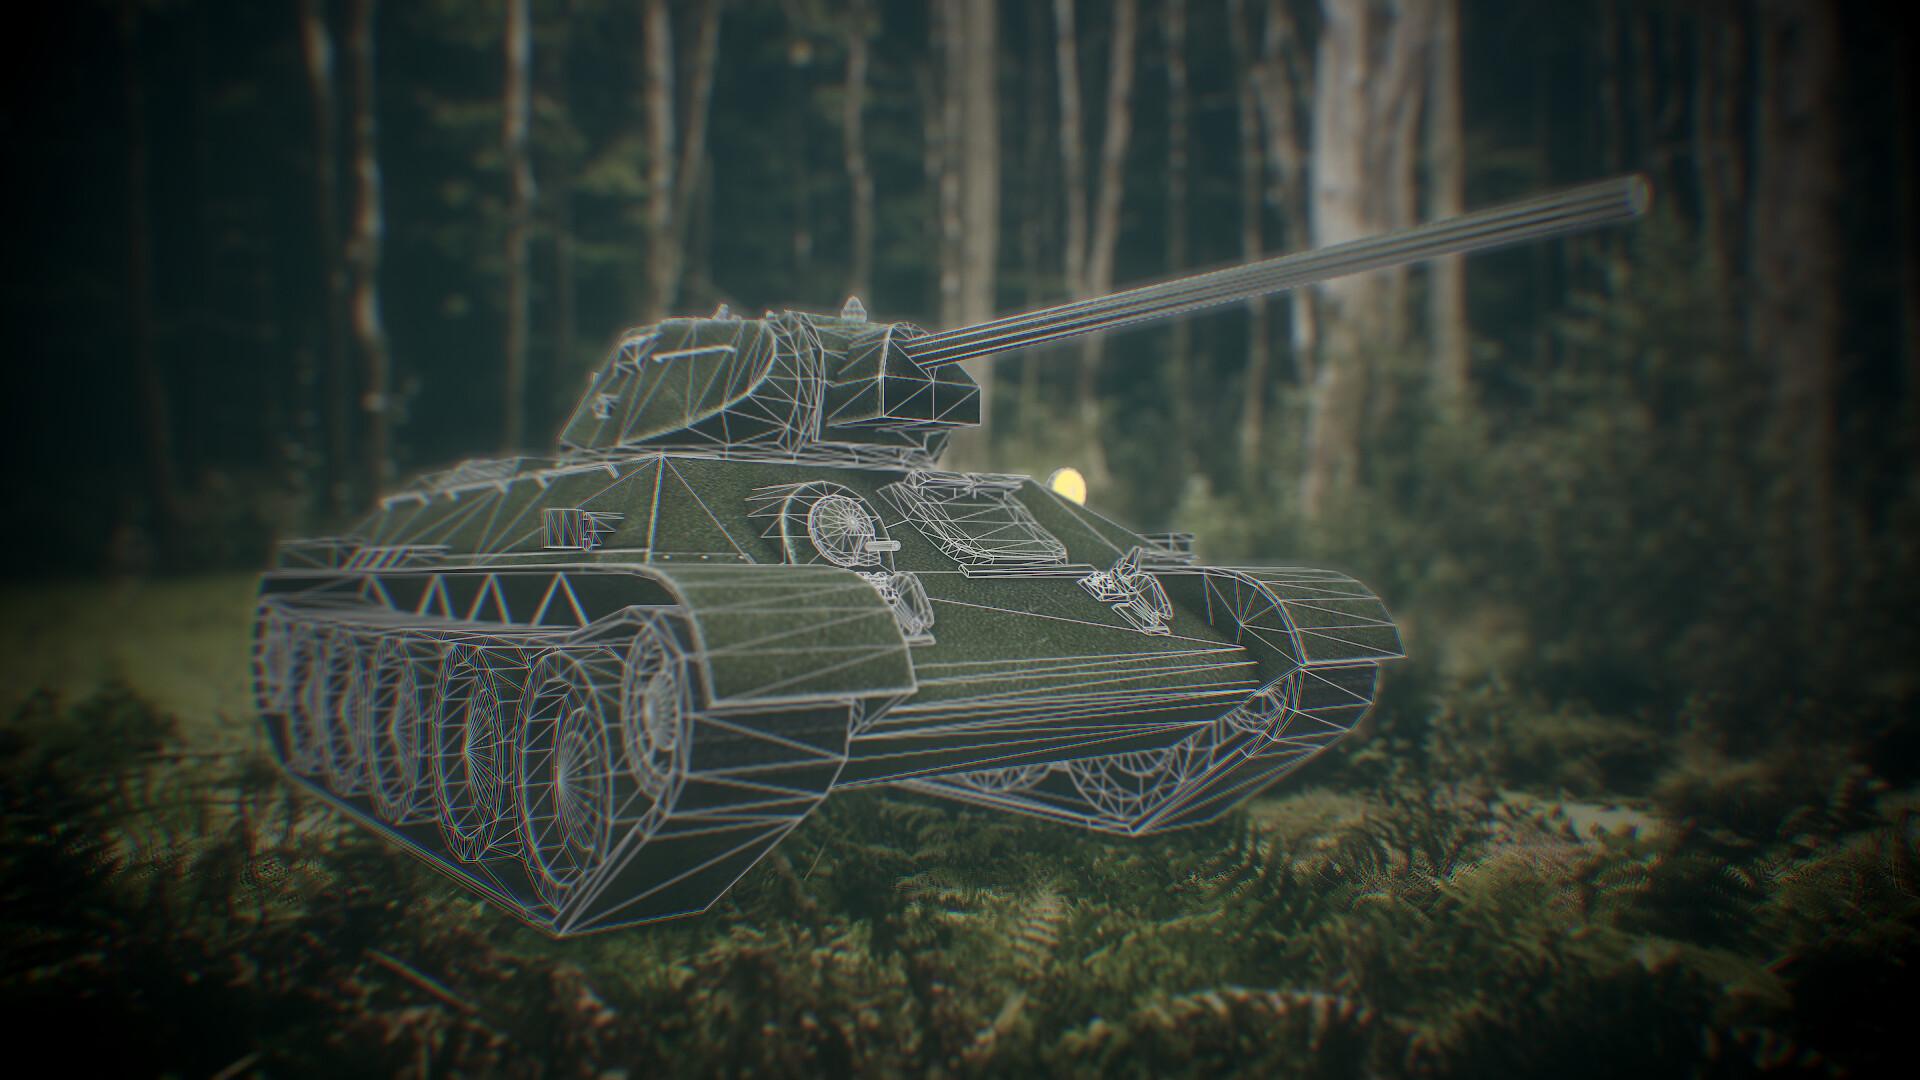 Low Poly Soviet Tank T-34 Game ready  2013 scorpion3dcom  Tomas Laureckis